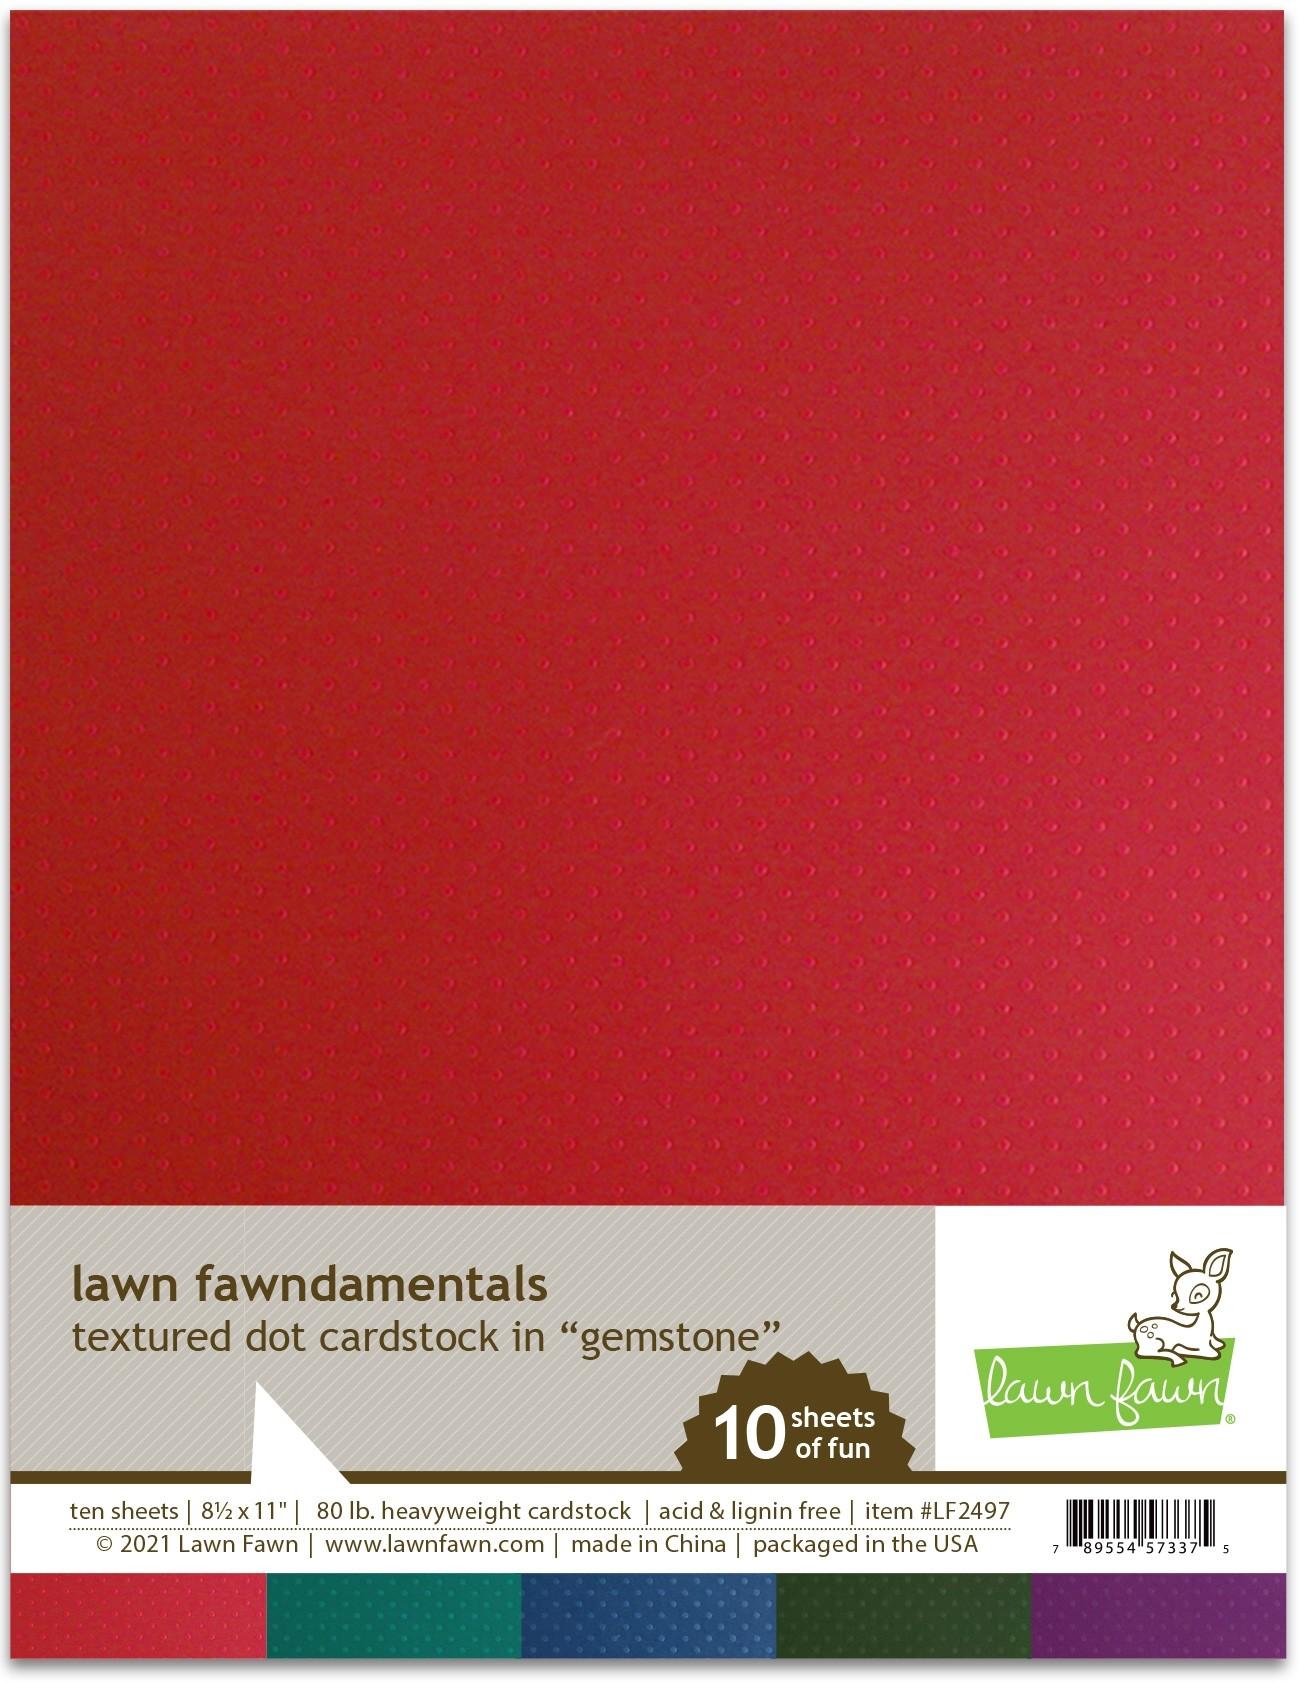 Lawn Fawn Textured Dot Cardstock - gemstone